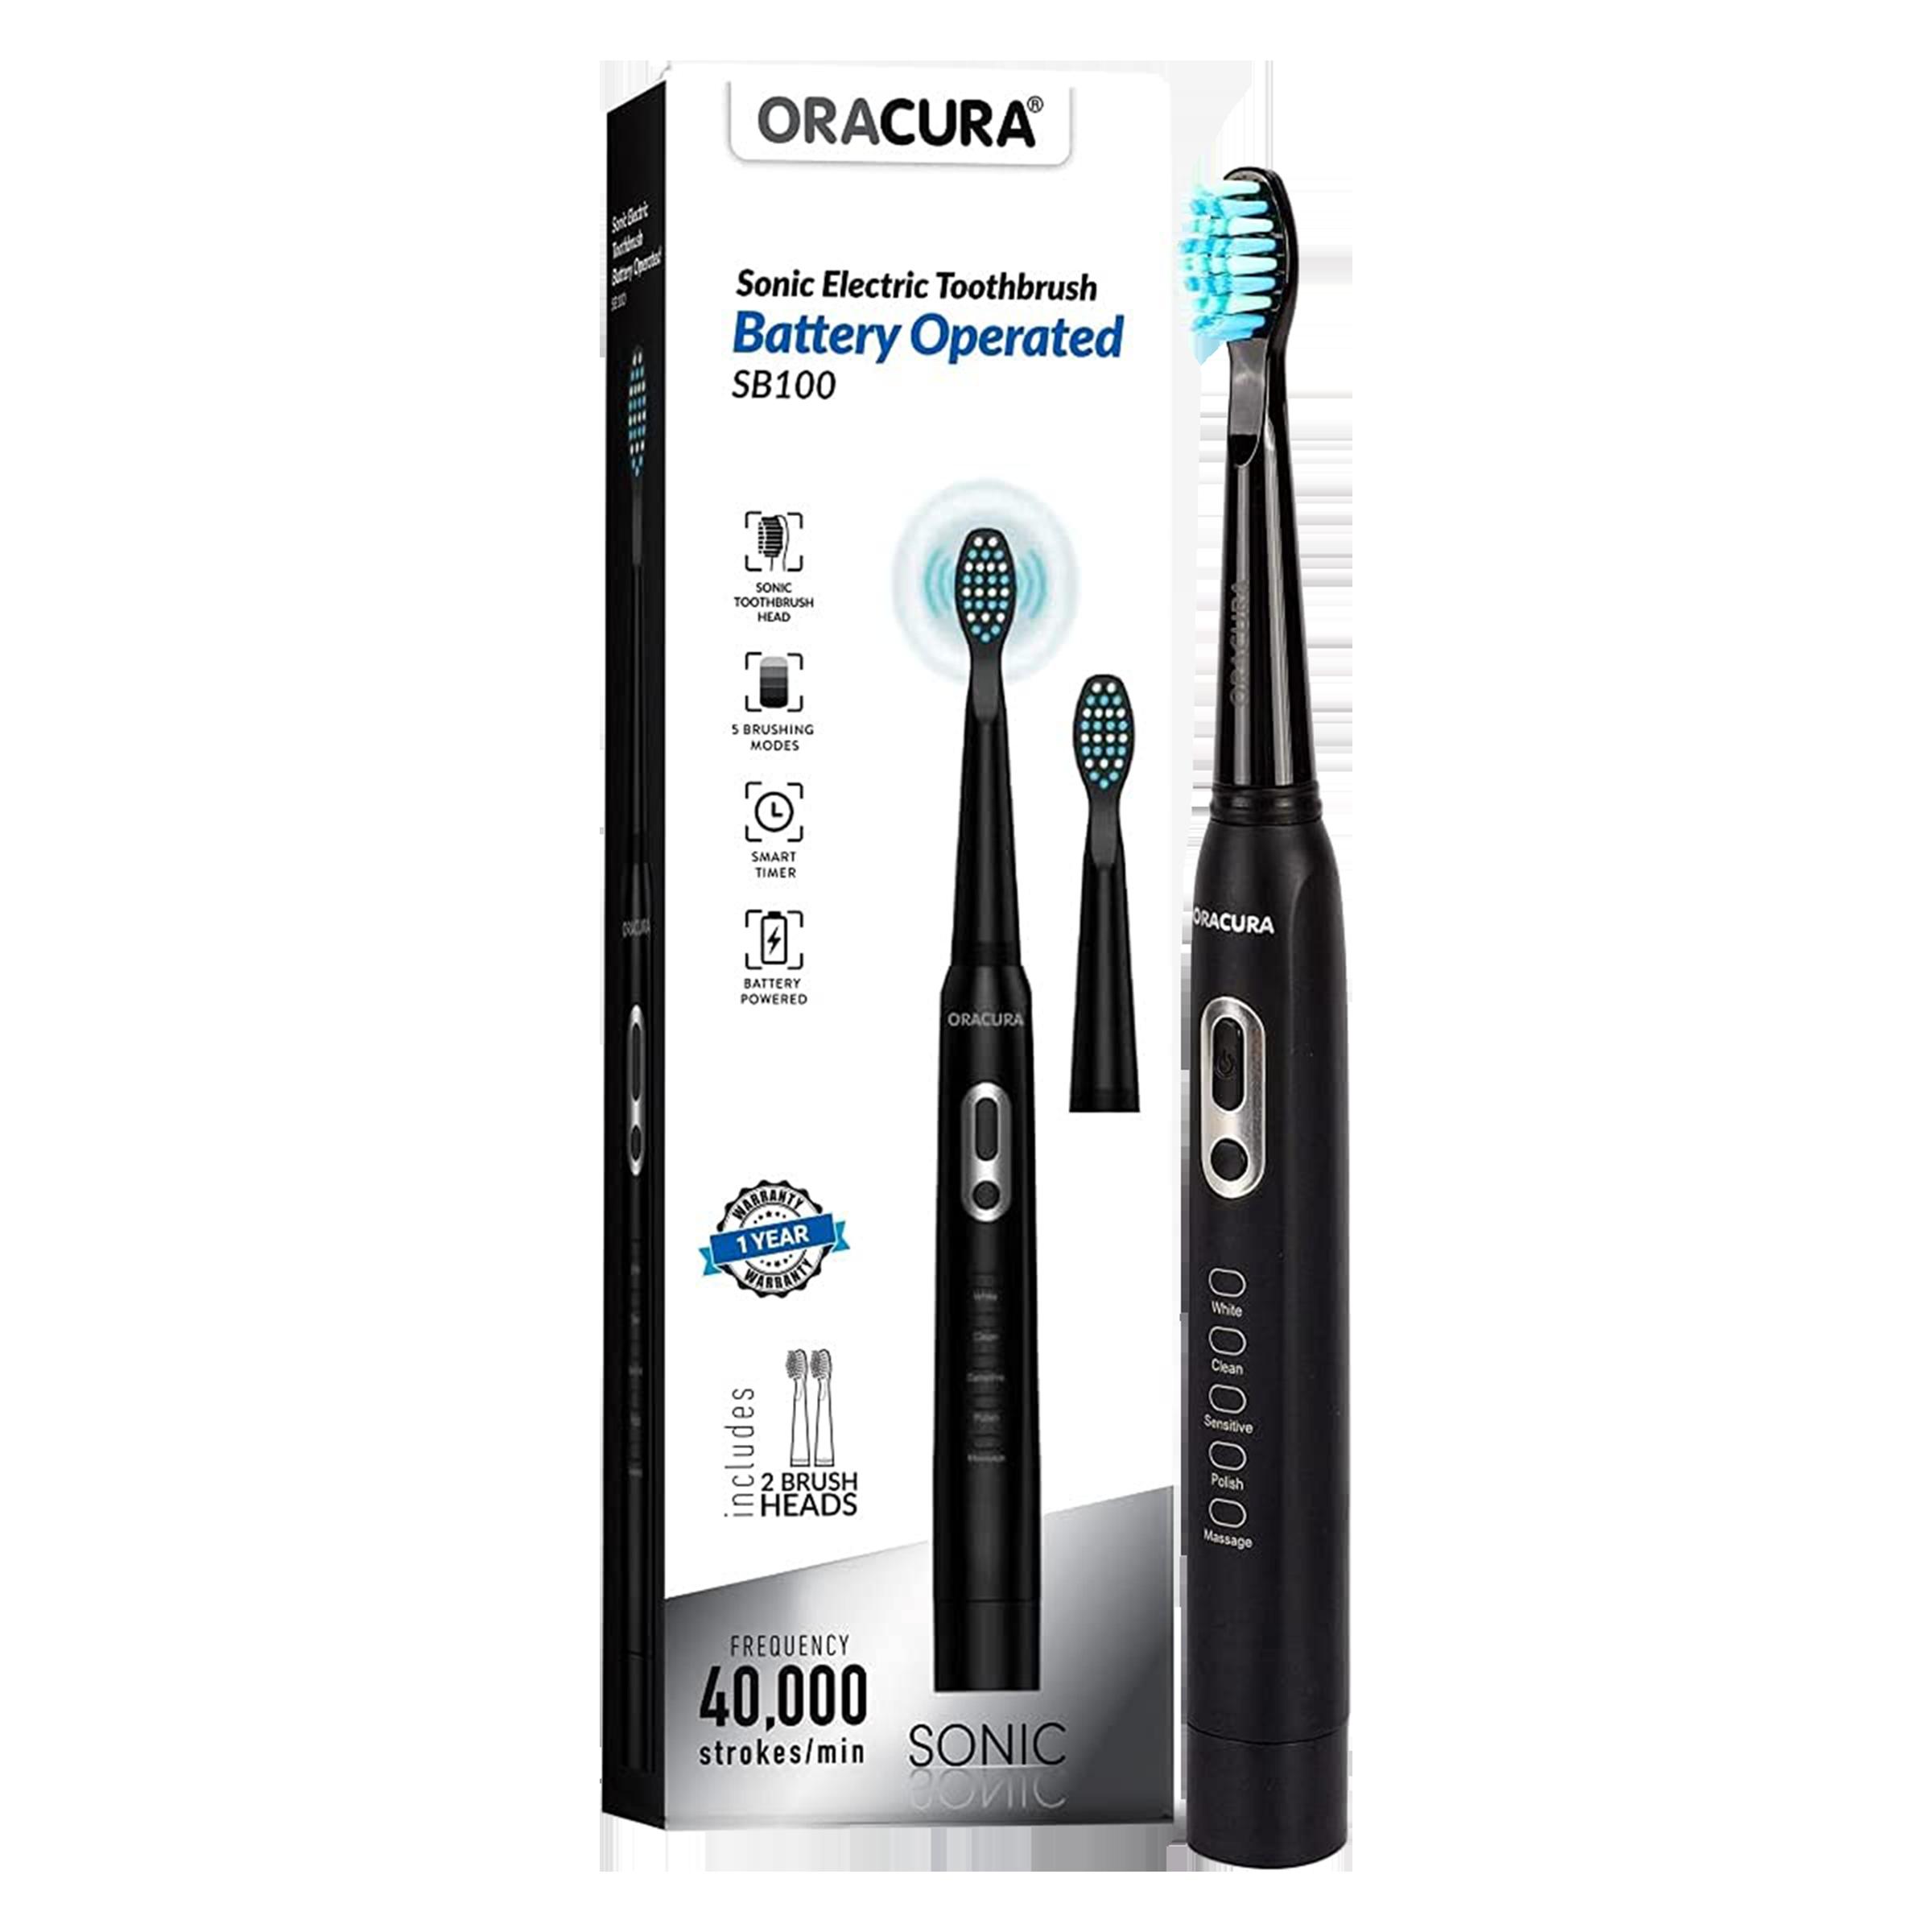 Oracura Electric Toothbrush for Unisex (Superior Gum Protection, SB100B, Black)_1